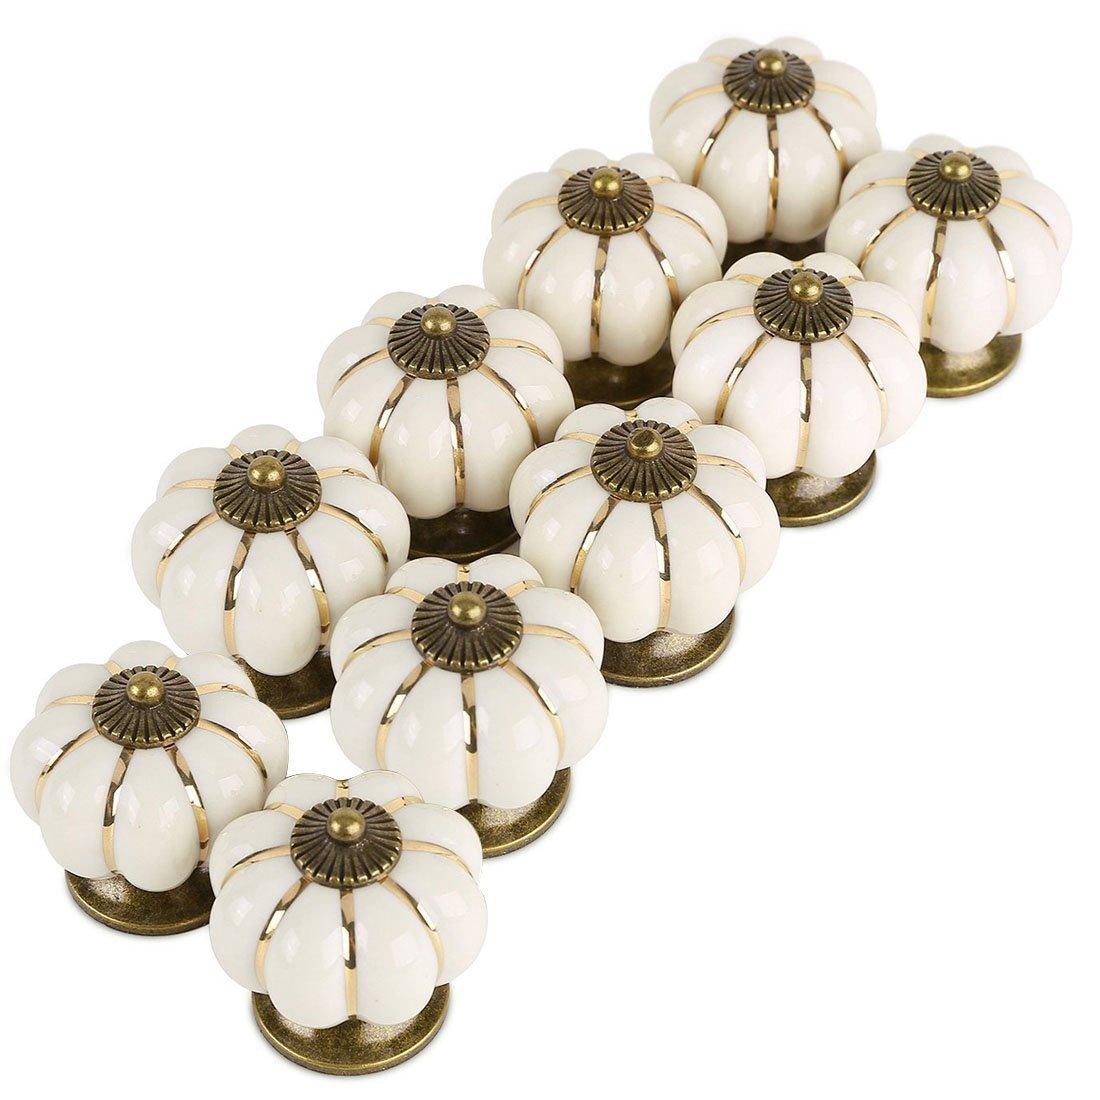 Pumpkin Ceramic Drawer Knobs, YIFAN Set of 10 Cabinet Pulls Dresser Cupboard Door Handles - White 4